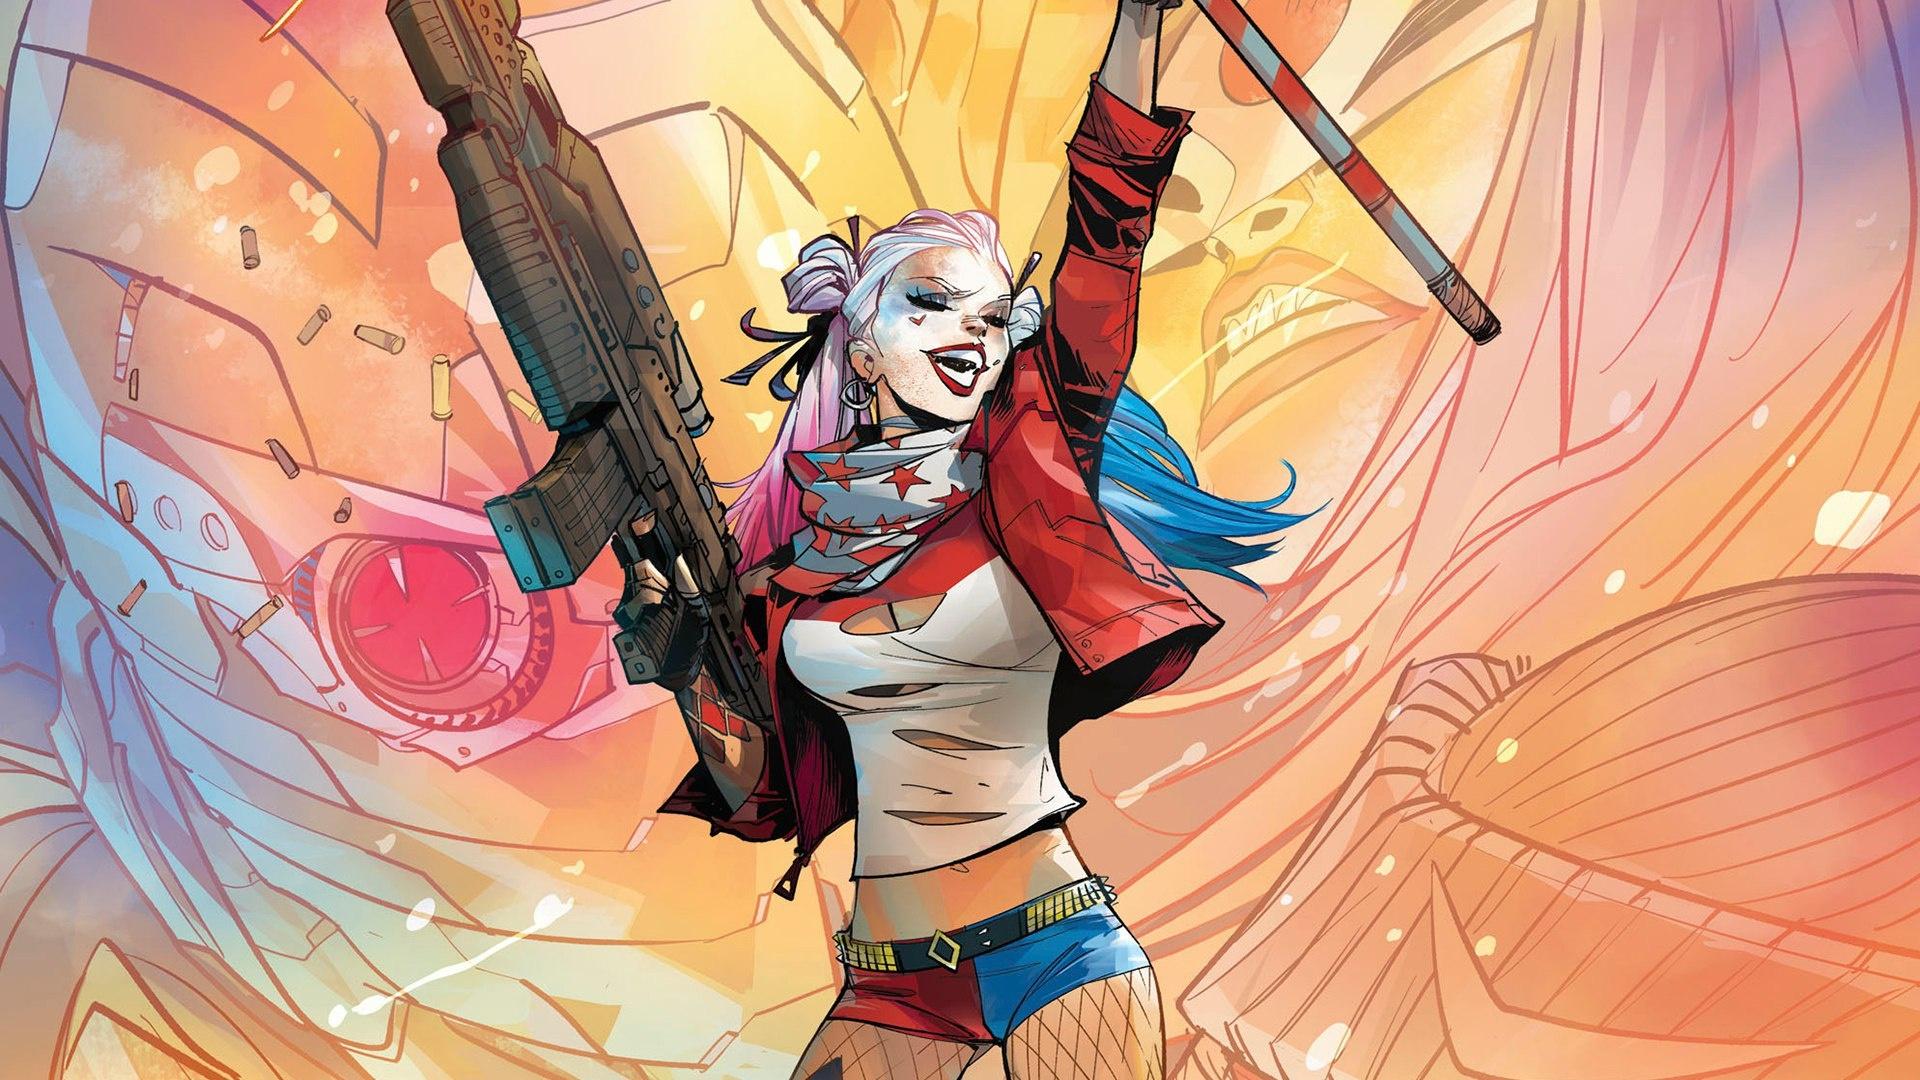 3840x2400 Harley Quinn Comic Art 4K 3840x2400 Resolution ...